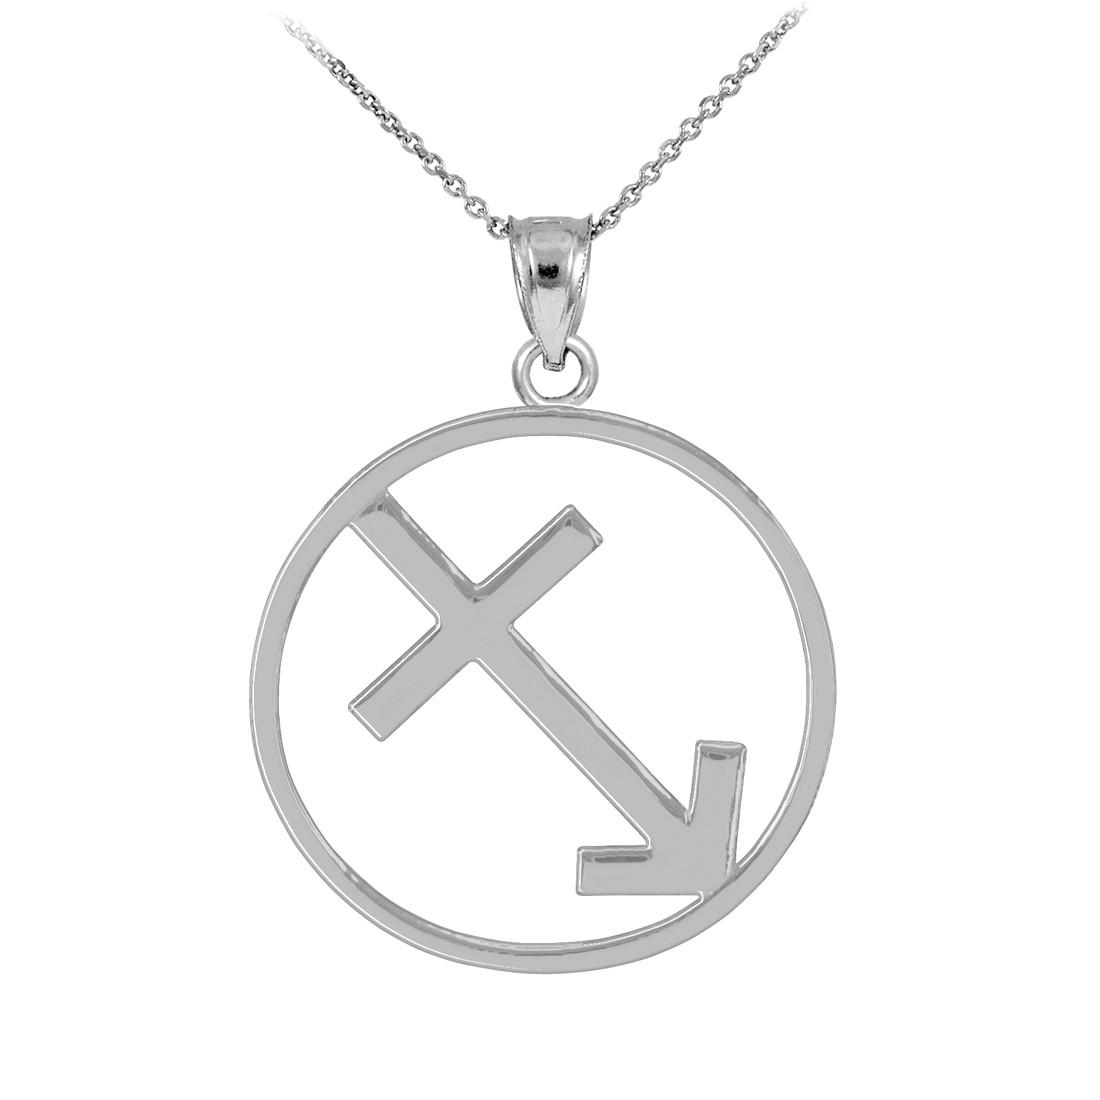 Polished White Gold Sagittarius Zodiac Sign Round Pendant Necklace